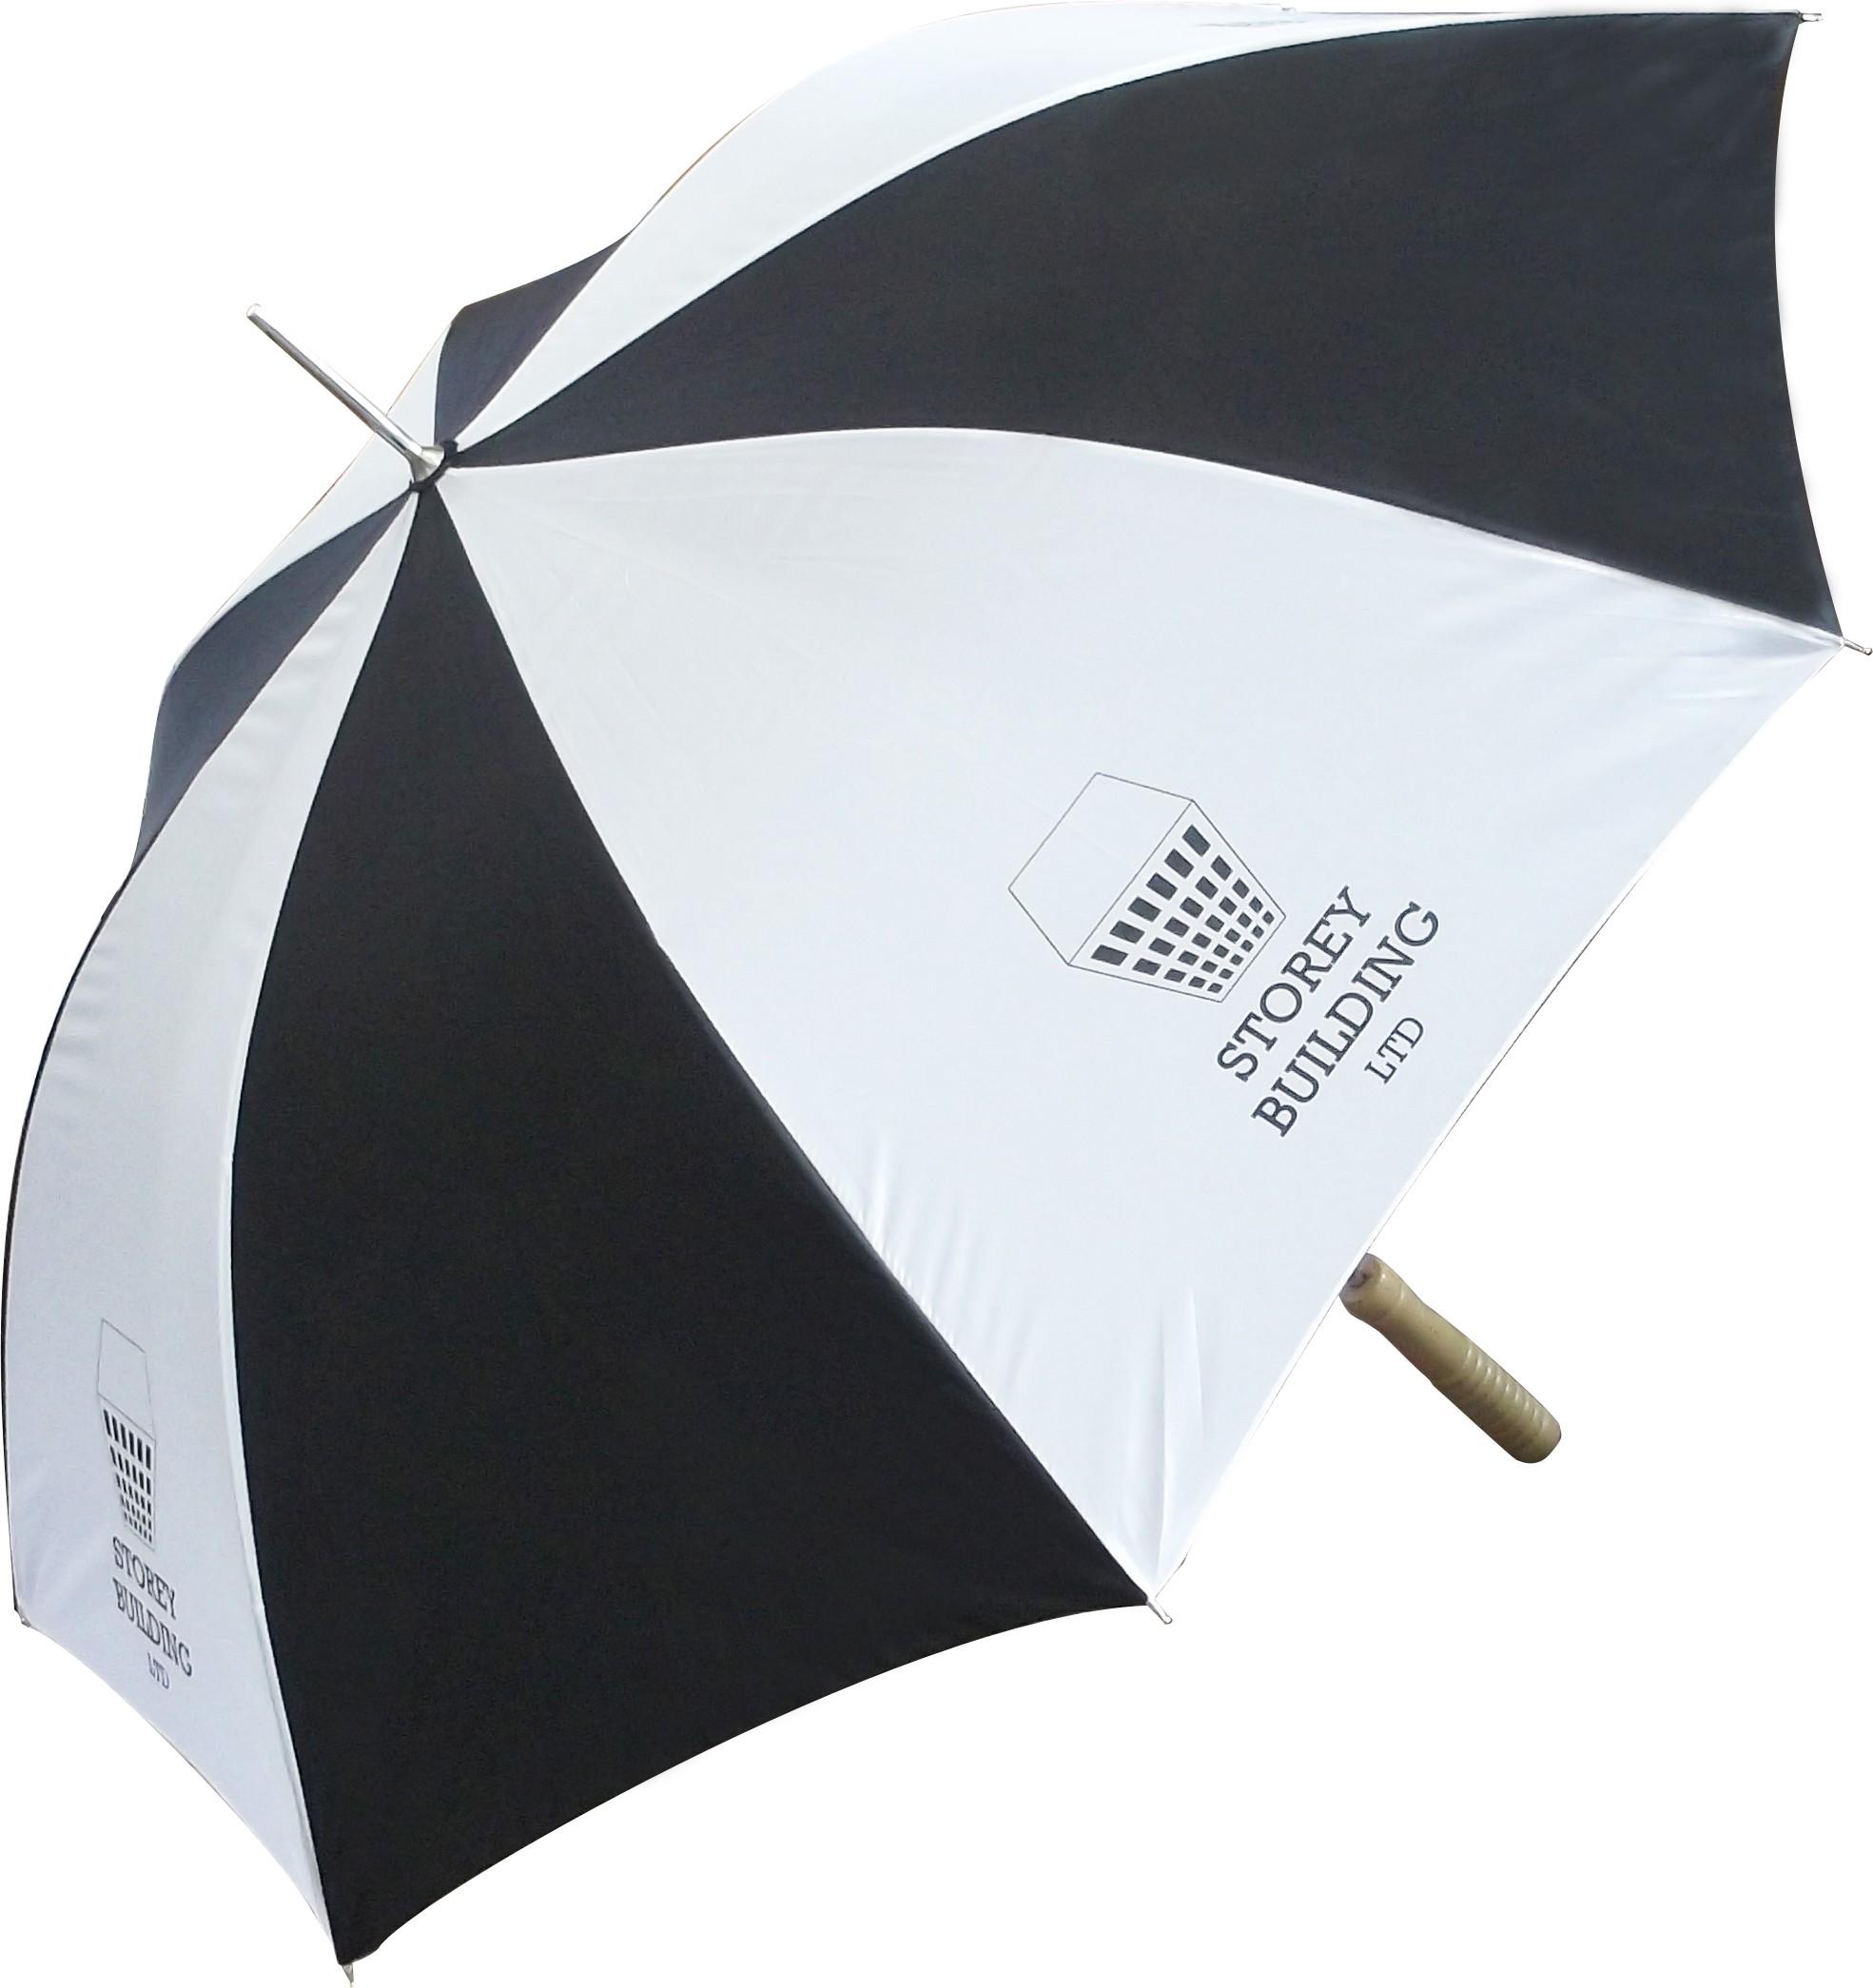 Printed Promotional Super Budget Umbrella